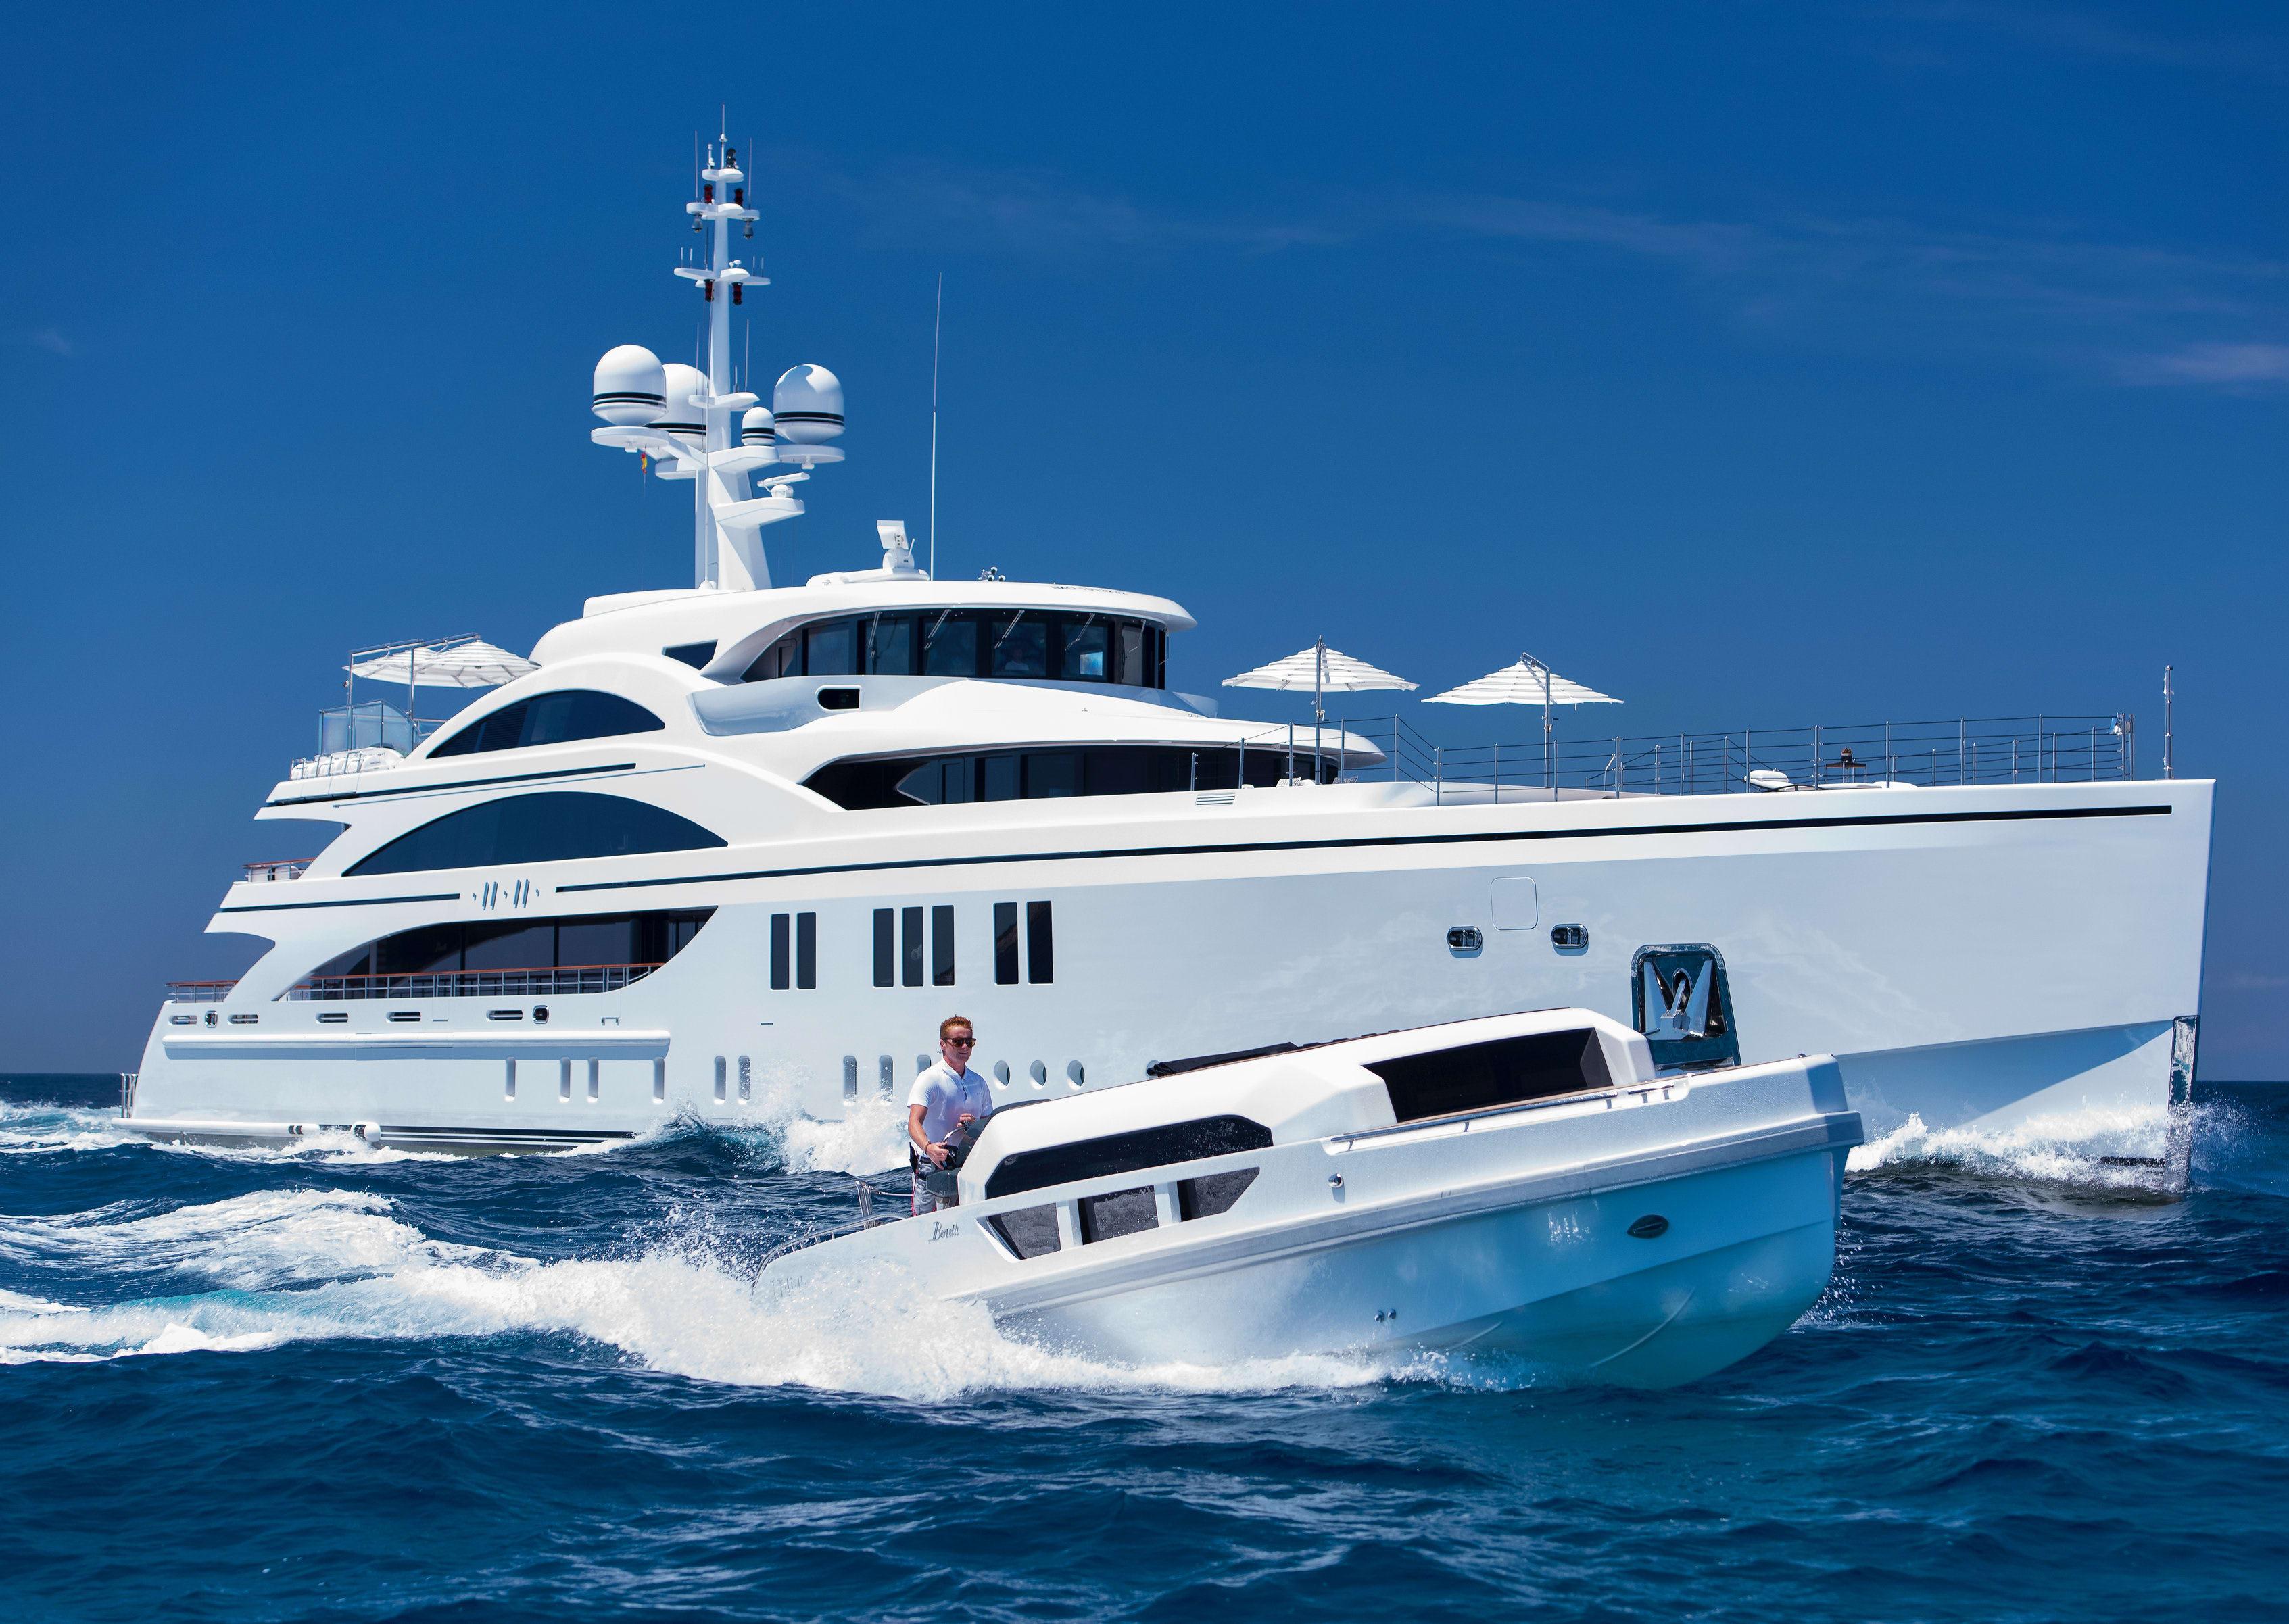 Image of 11.11 63.0M (206.7FT) motor yacht